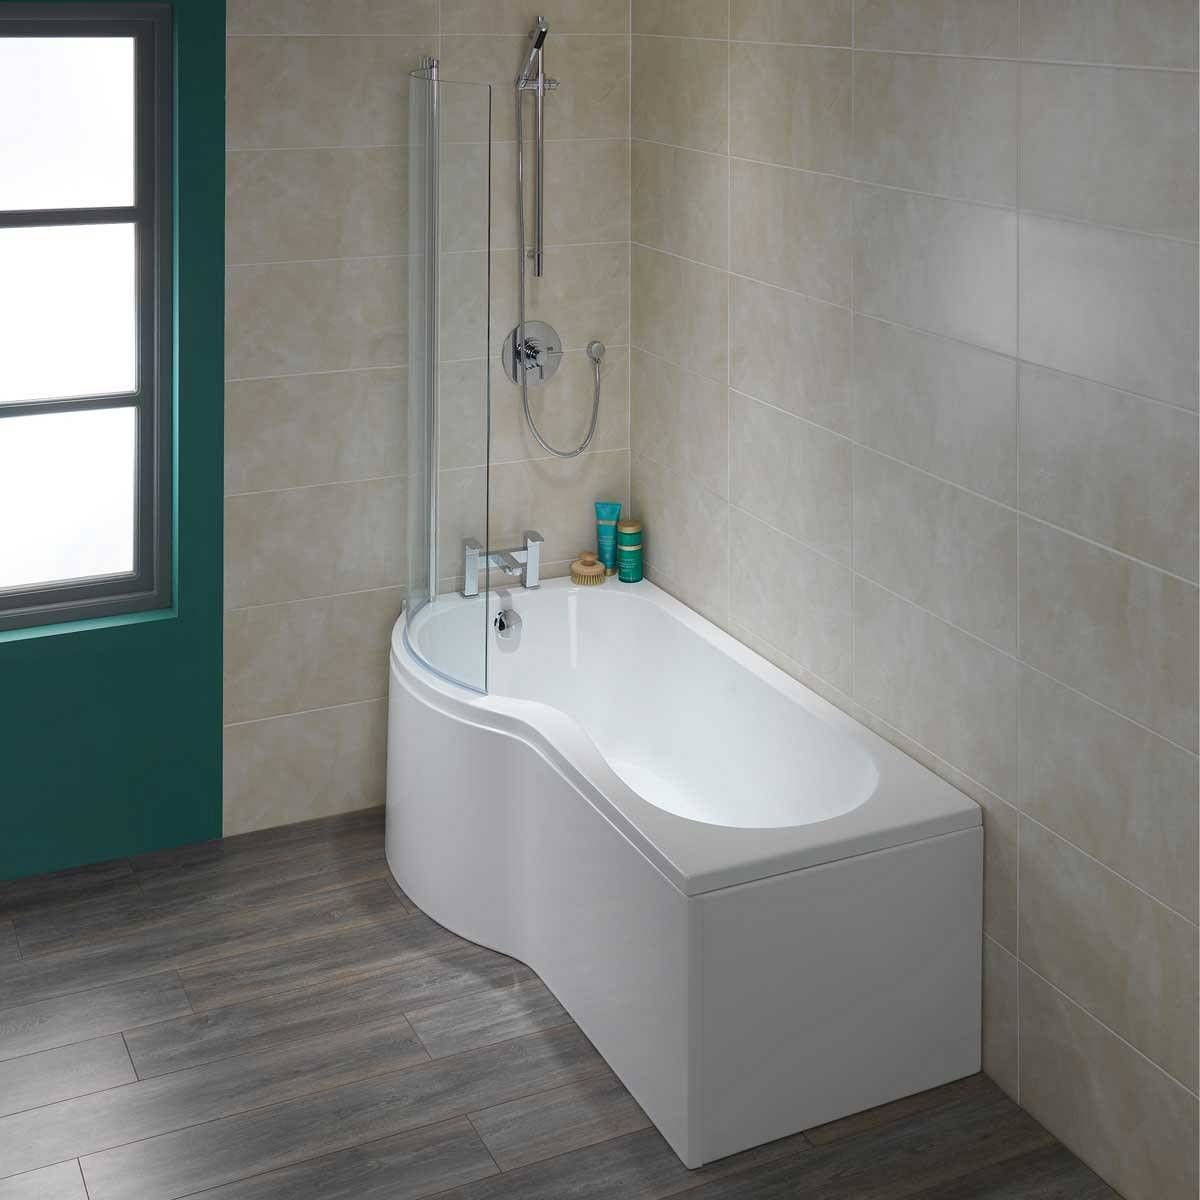 P Shape Shower Bath LH Screen New Bathroom Ideas - Plum towels for small bathroom ideas